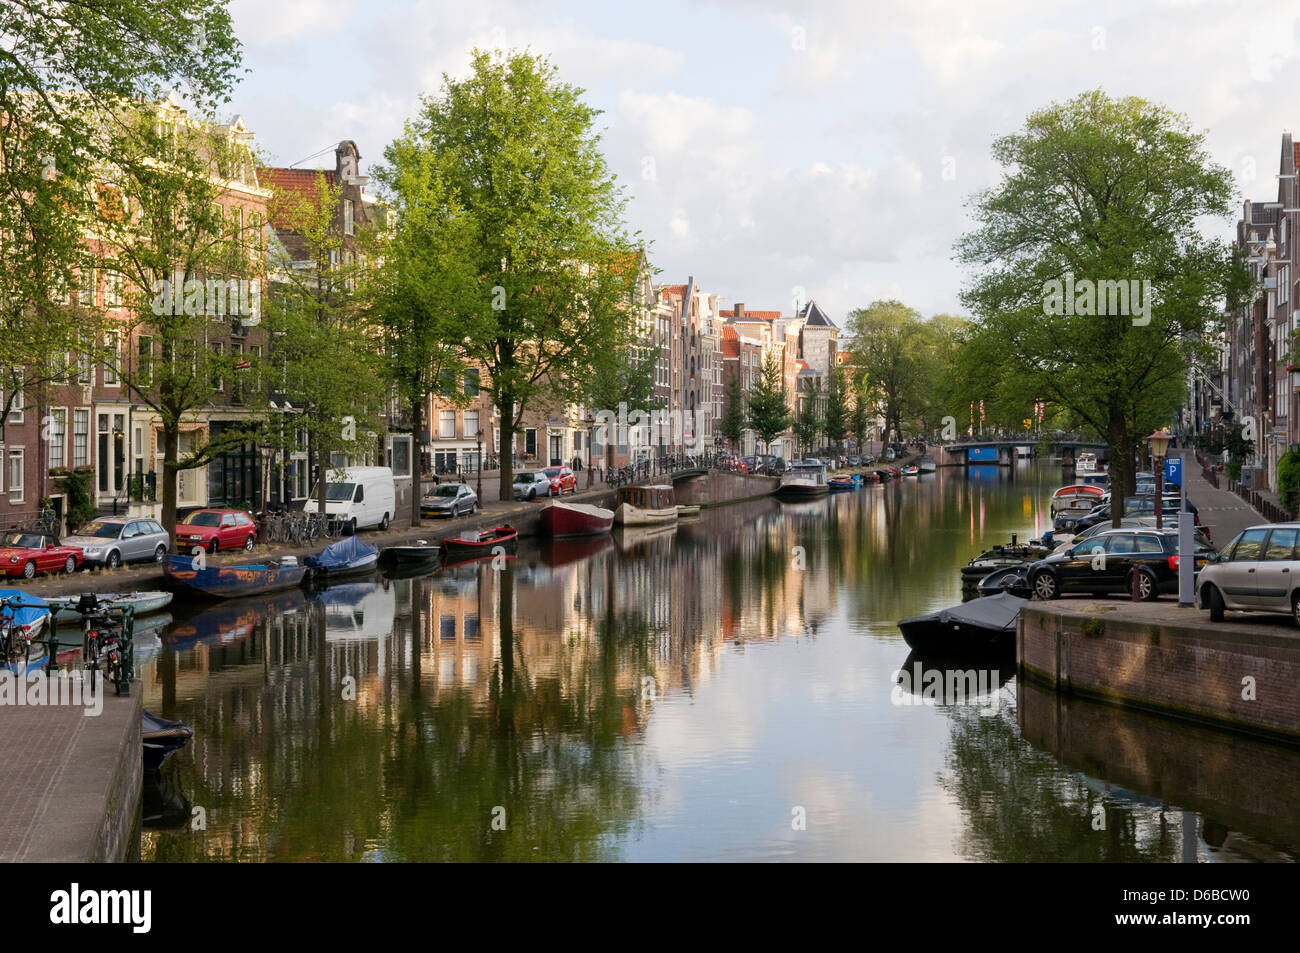 Prinsengracht, Amsterdam, Netherlands - Stock Image